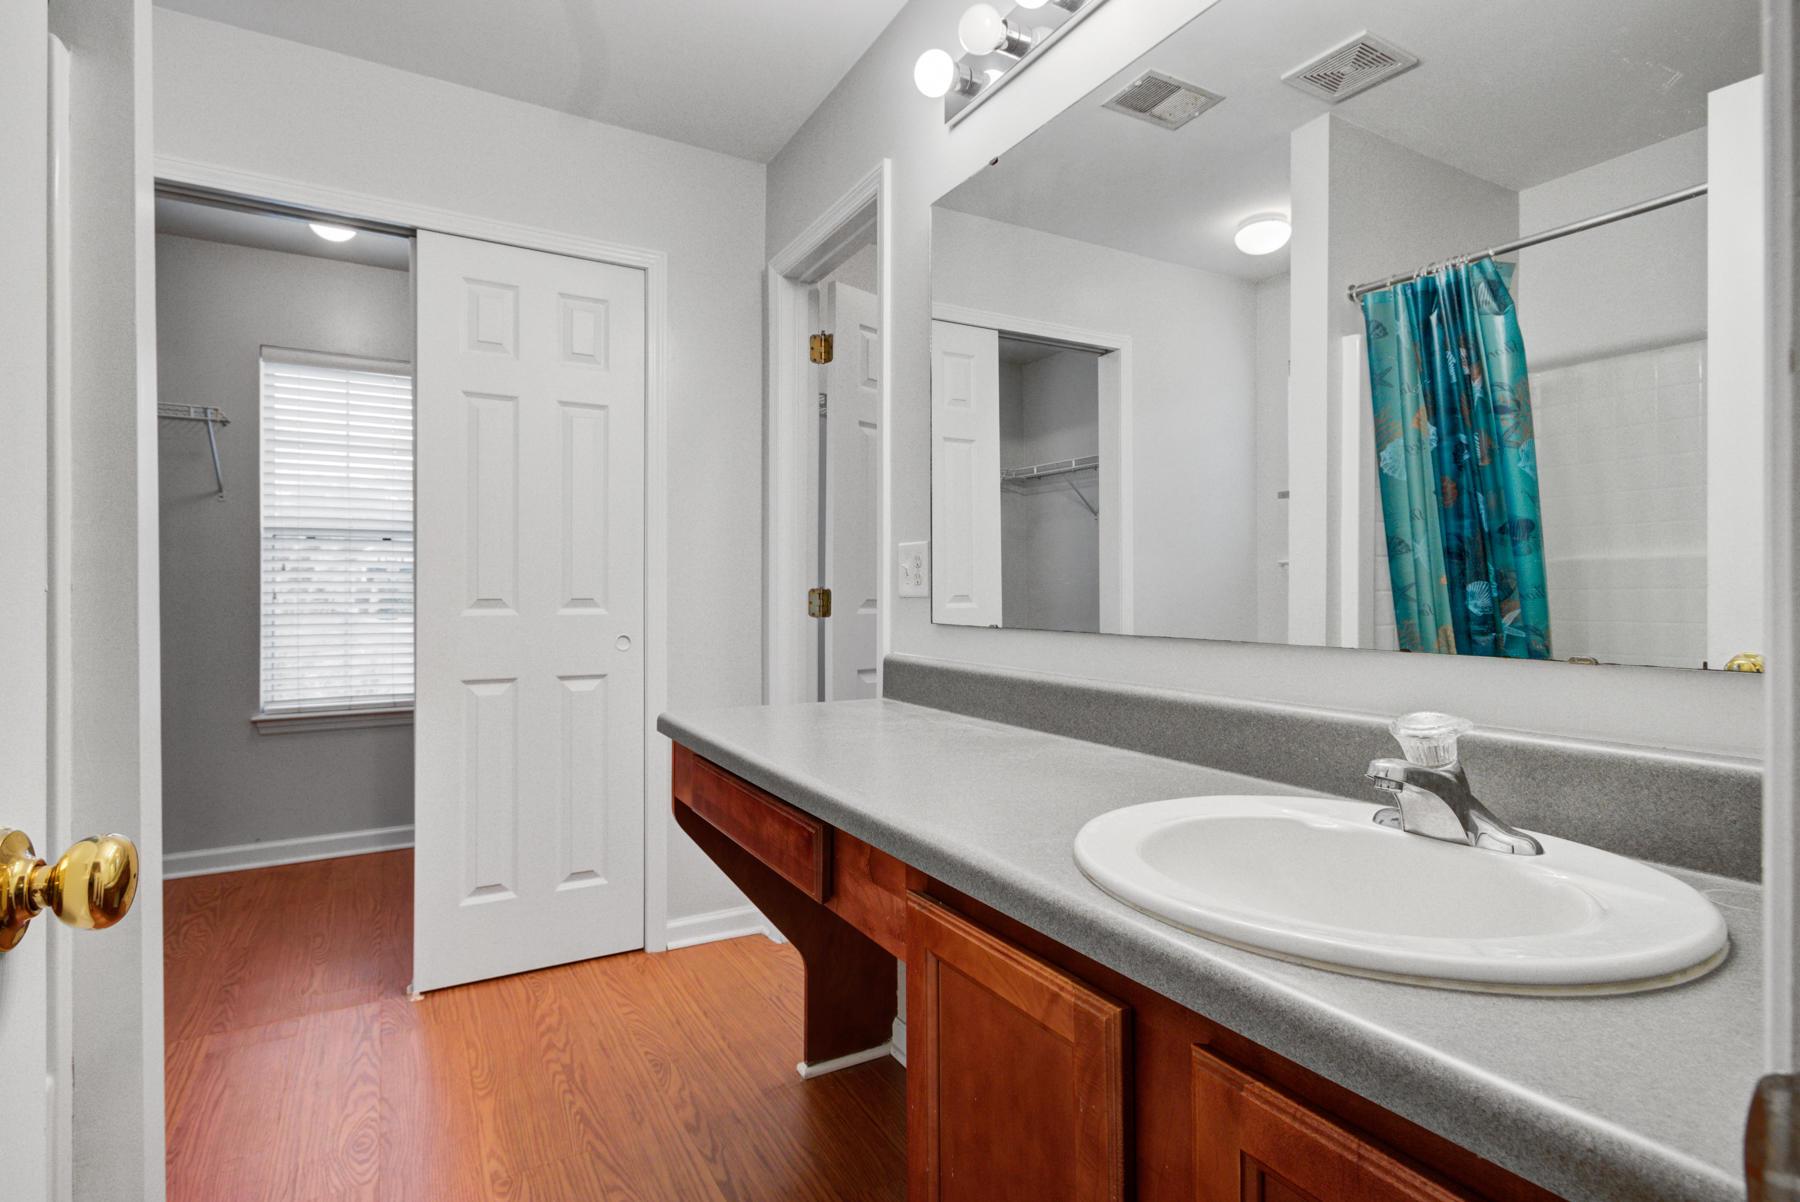 Grand Oaks Plantation Homes For Sale - 564 Hainesworth, Charleston, SC - 7